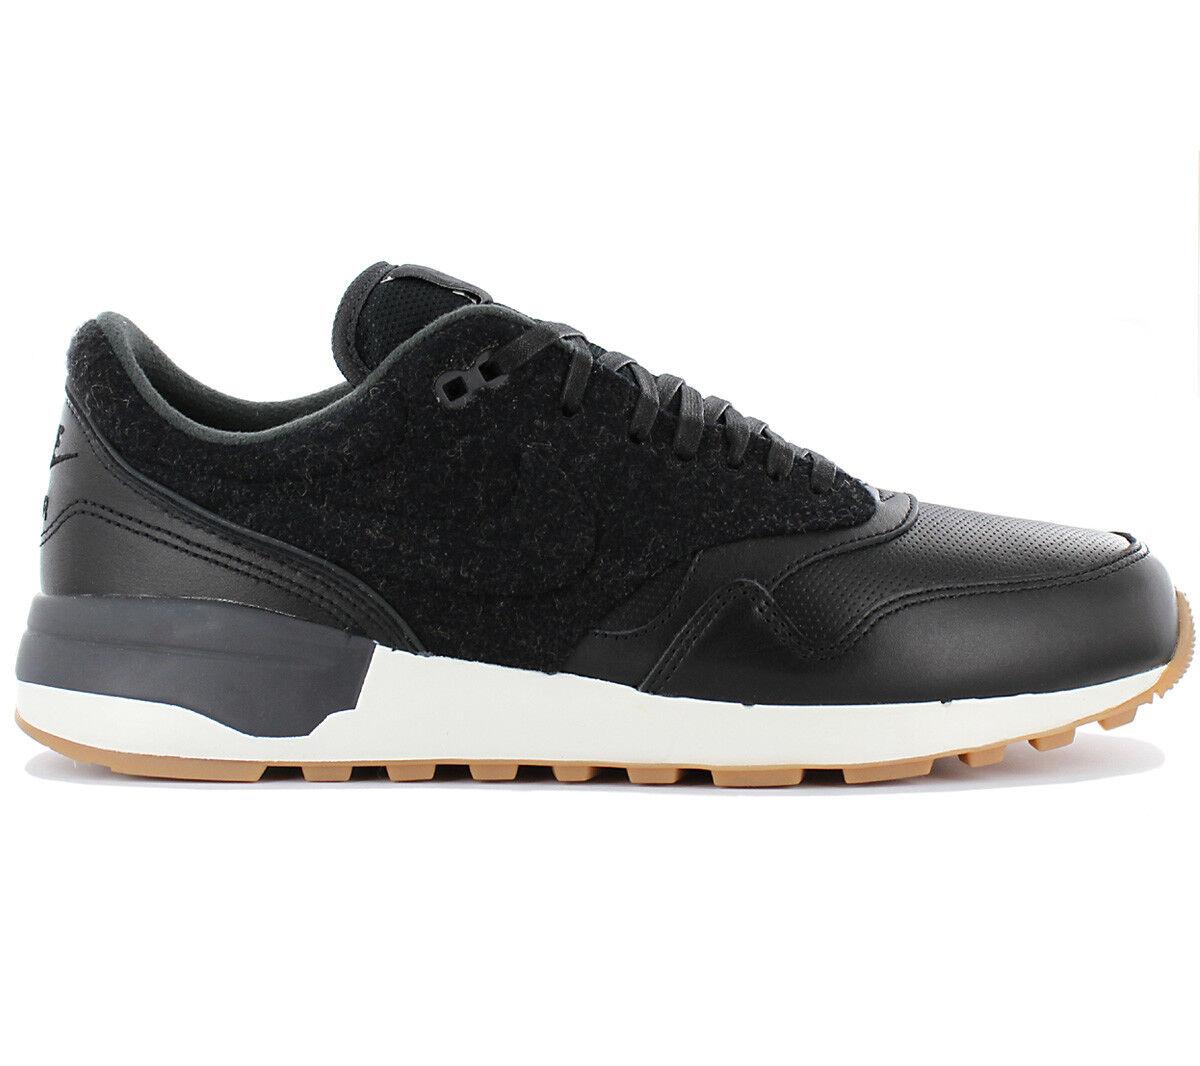 Nike para Air Odyssey LX Zapatillas Estilo Deportivas para Nike Hombre Negro de Ocio cb7573